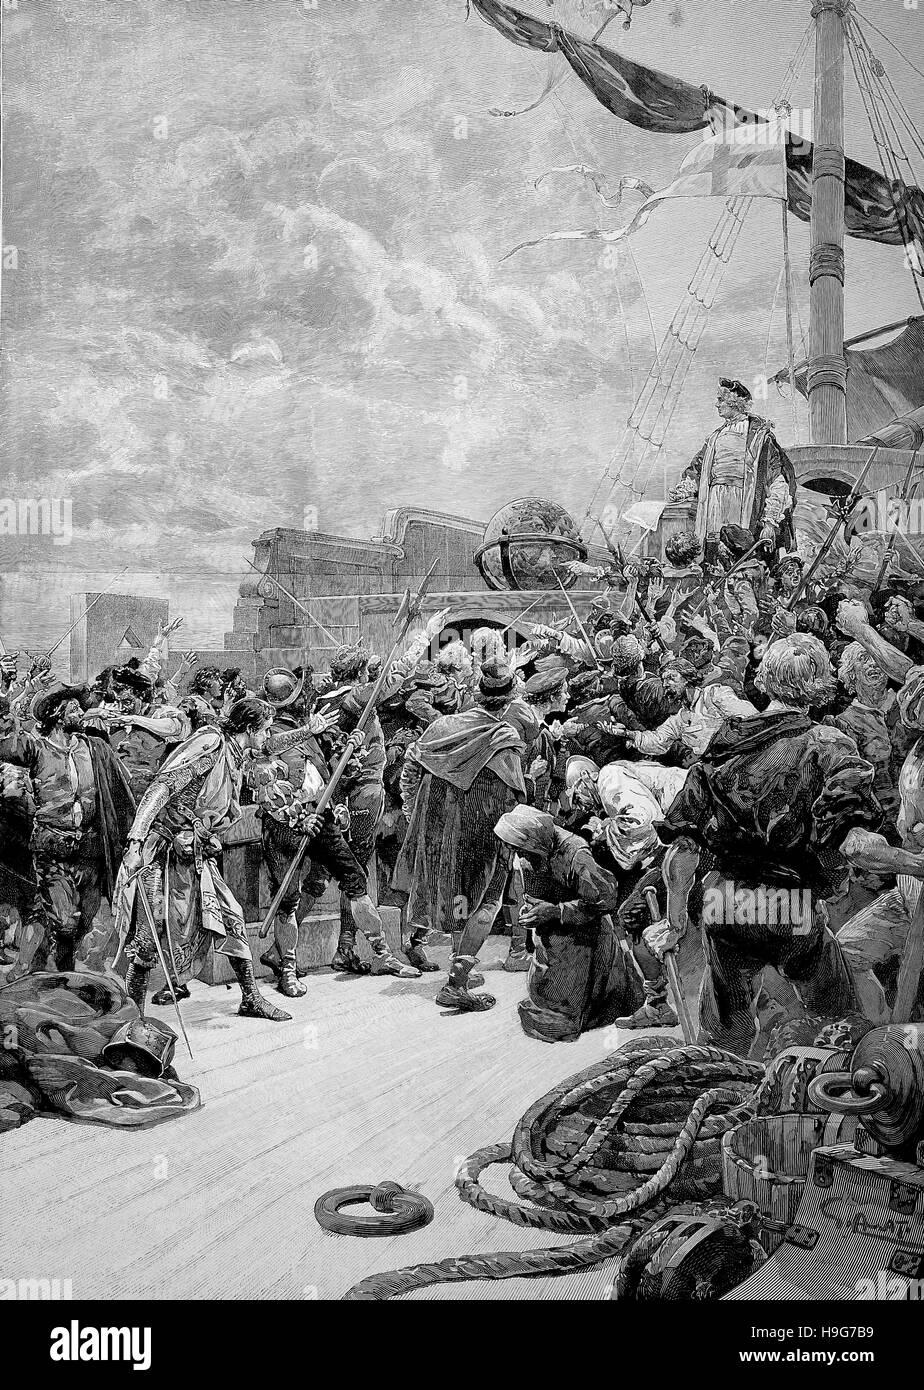 Christopher Columbus, 1451 - 20 May 1506, was an Italian explorer,  navigator,